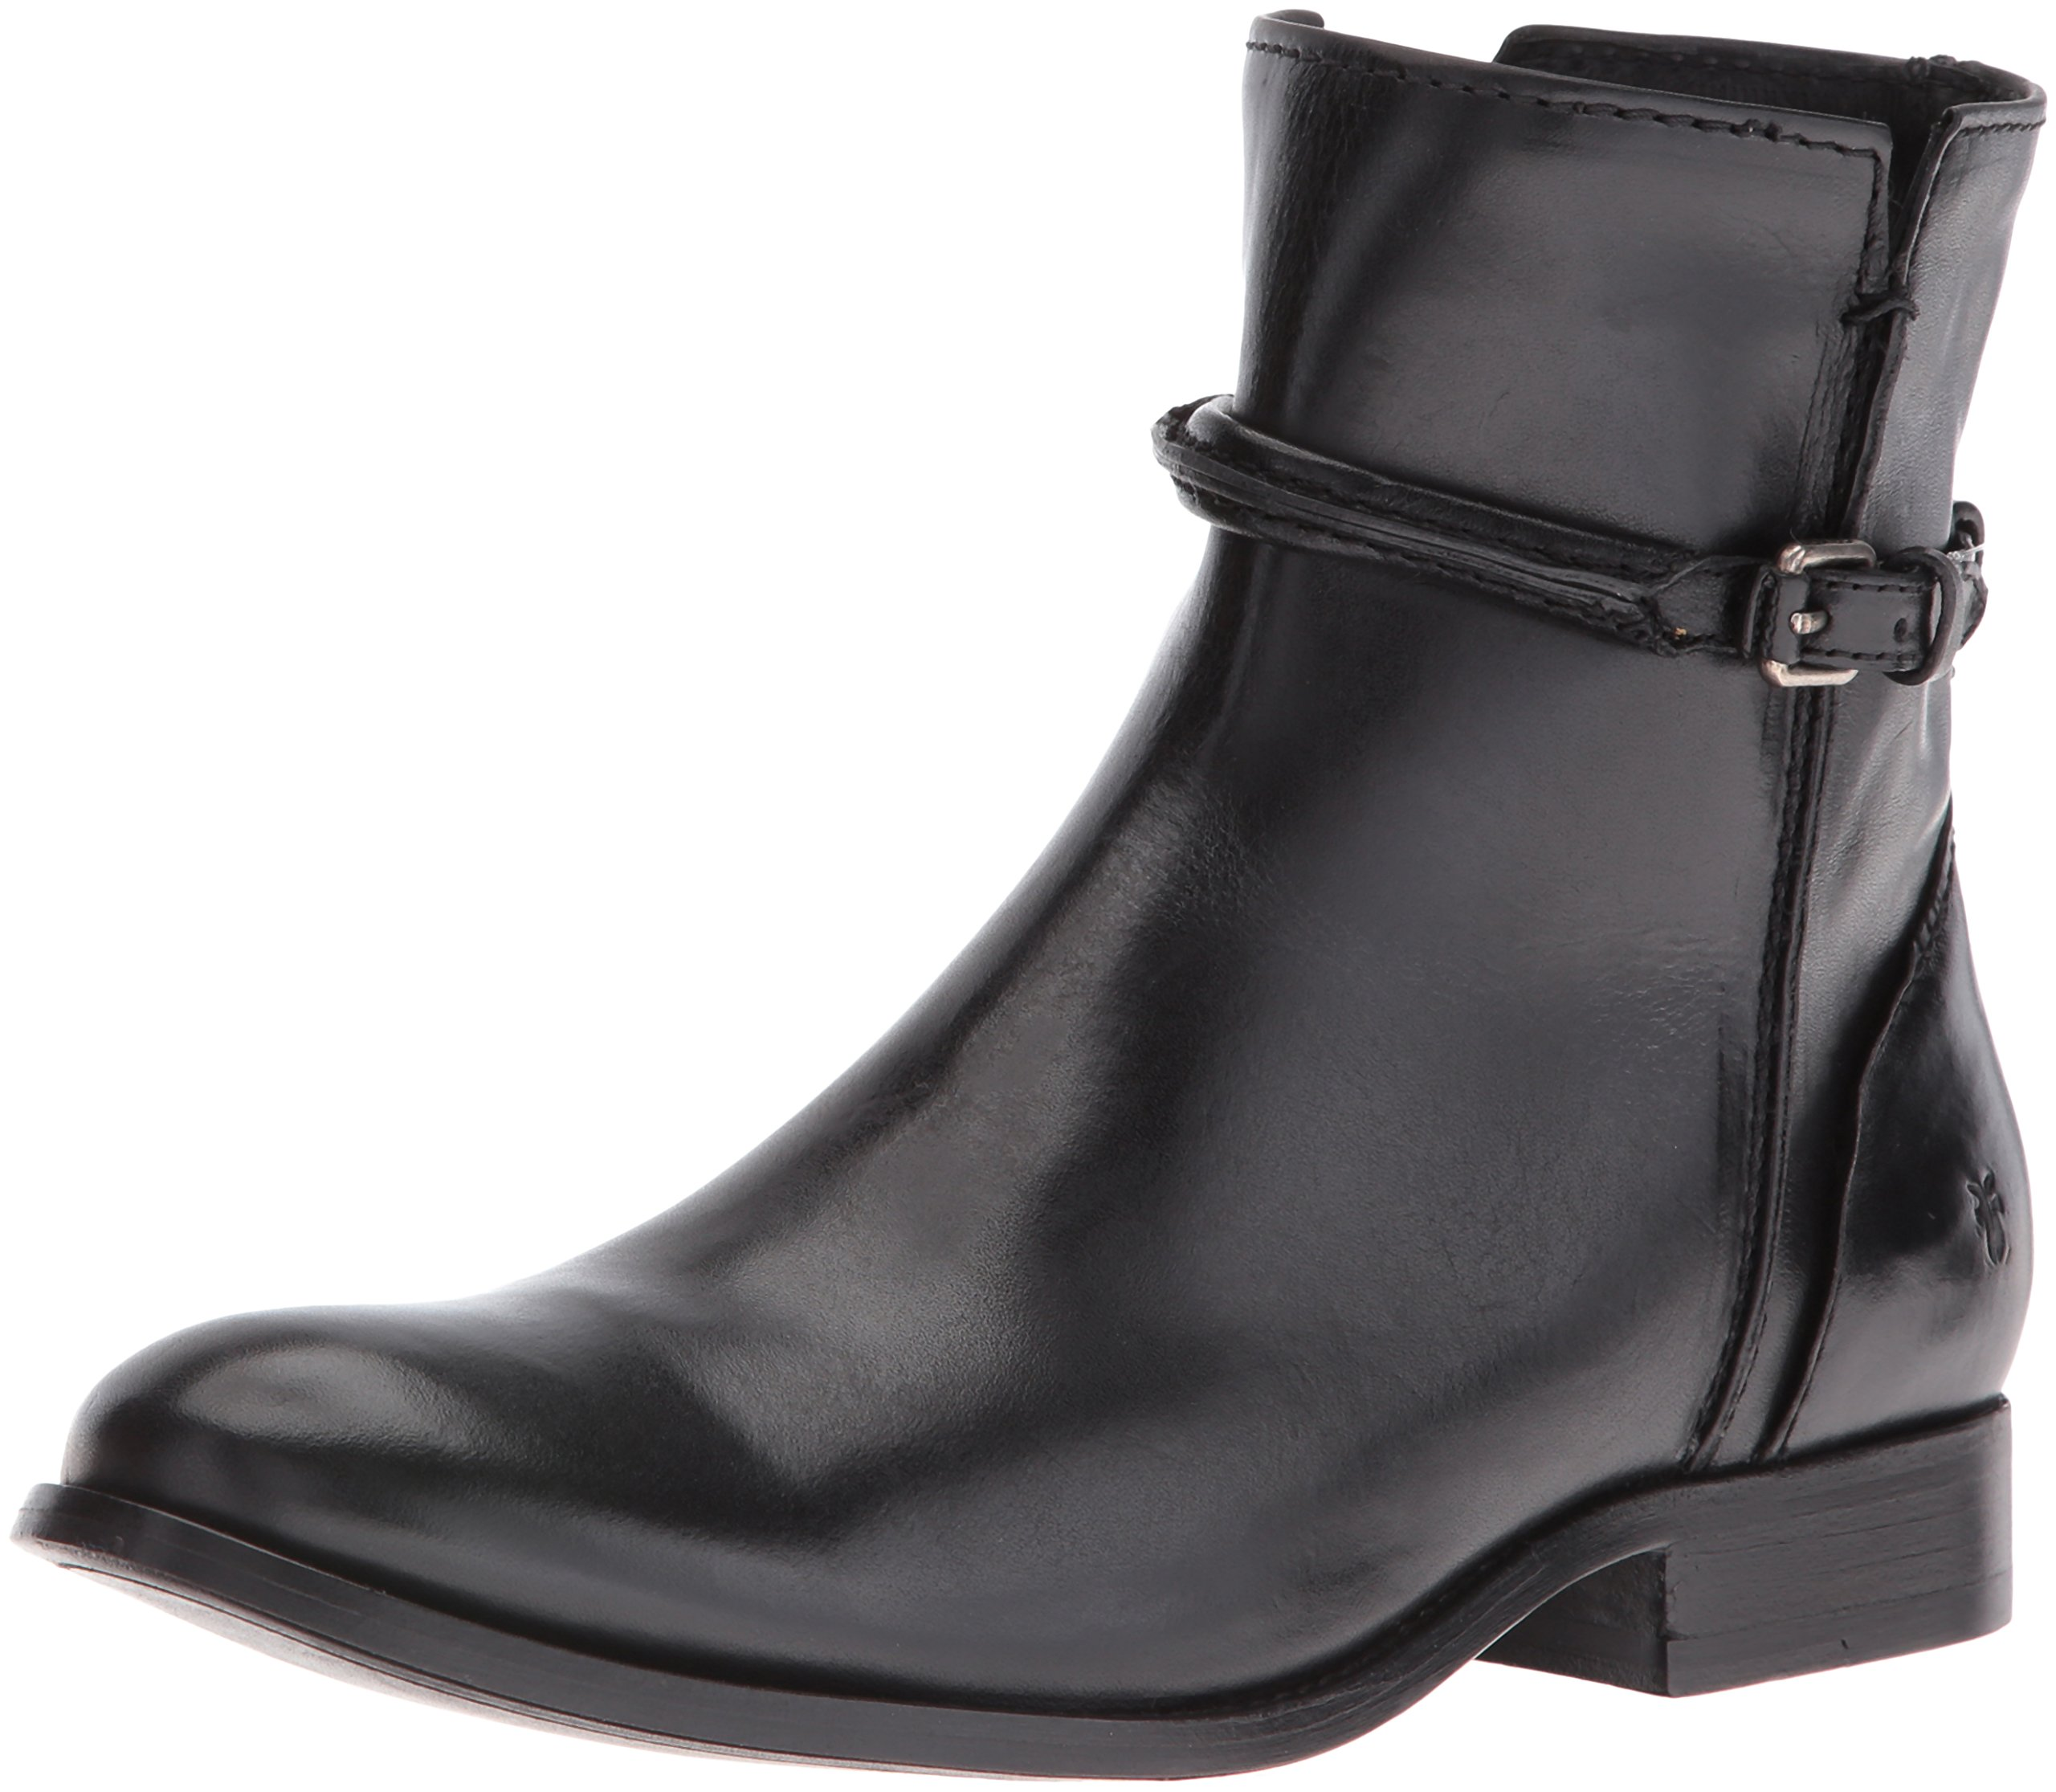 FRYE Women's Melissa Seam Short Boot, Black, 5.5 M US